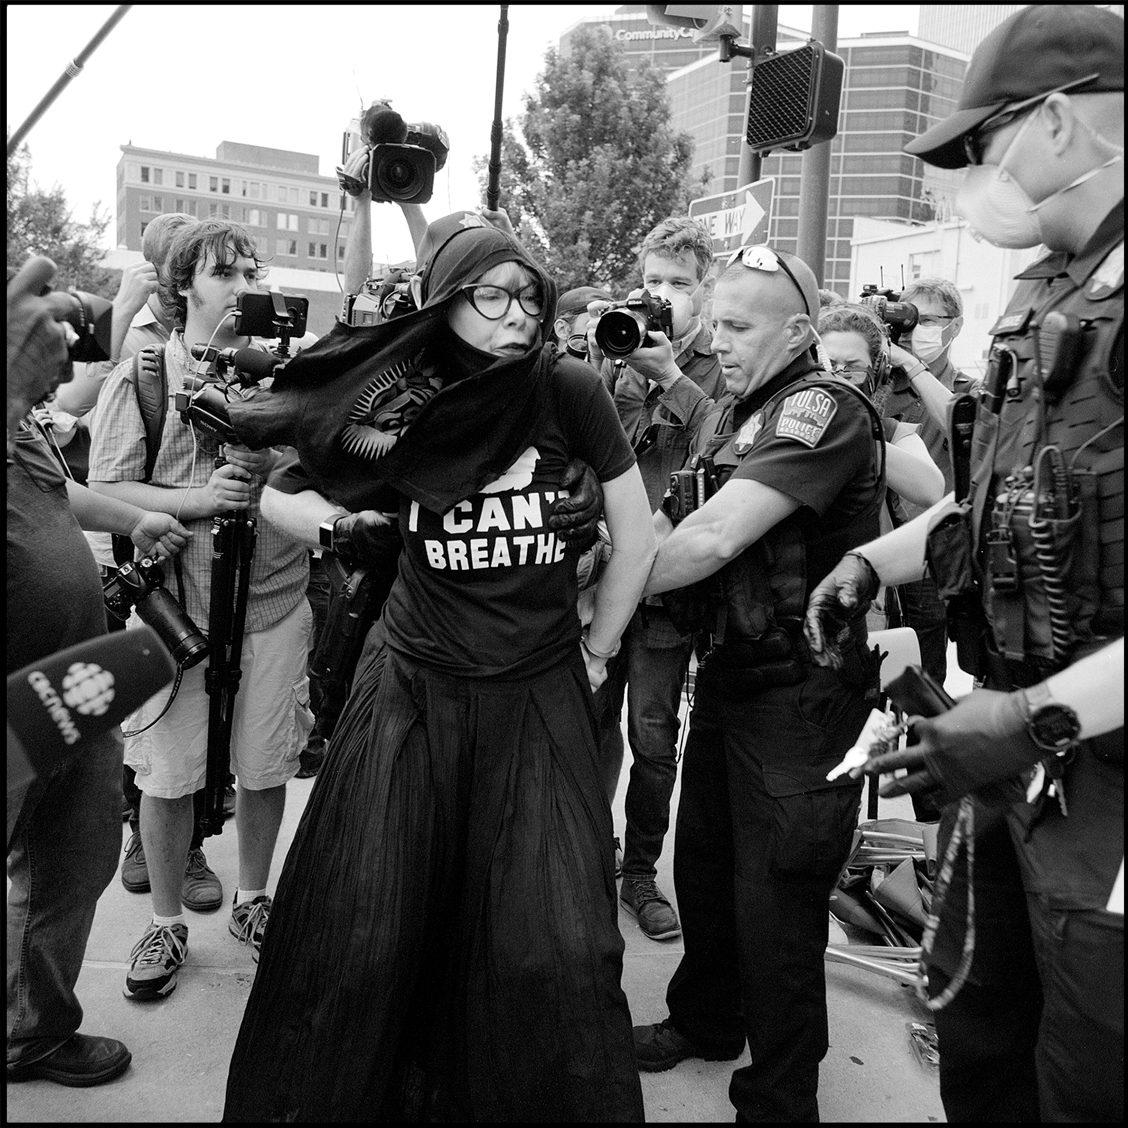 The arrest of Sheila Buck, at Donald Trump's rally. Tulsa, OK. Ilford Delta 400.